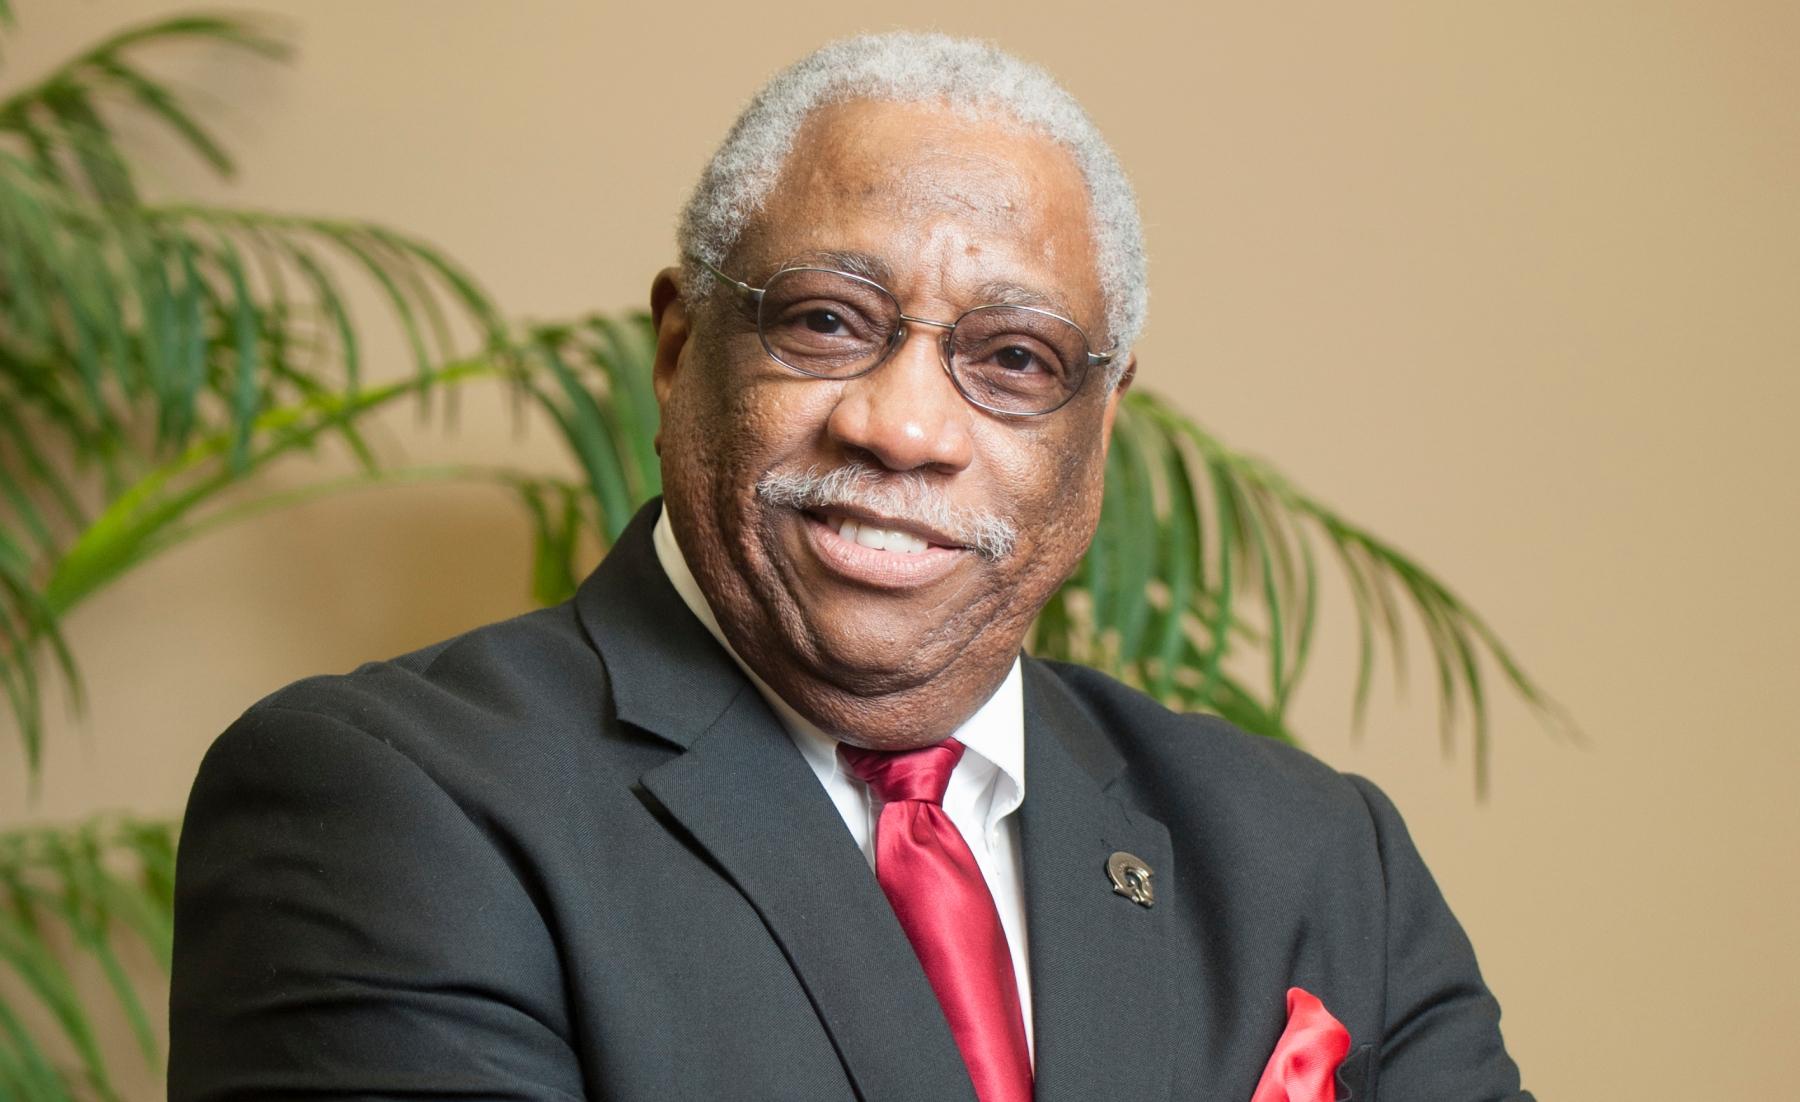 Dr. Charles W. Donaldson